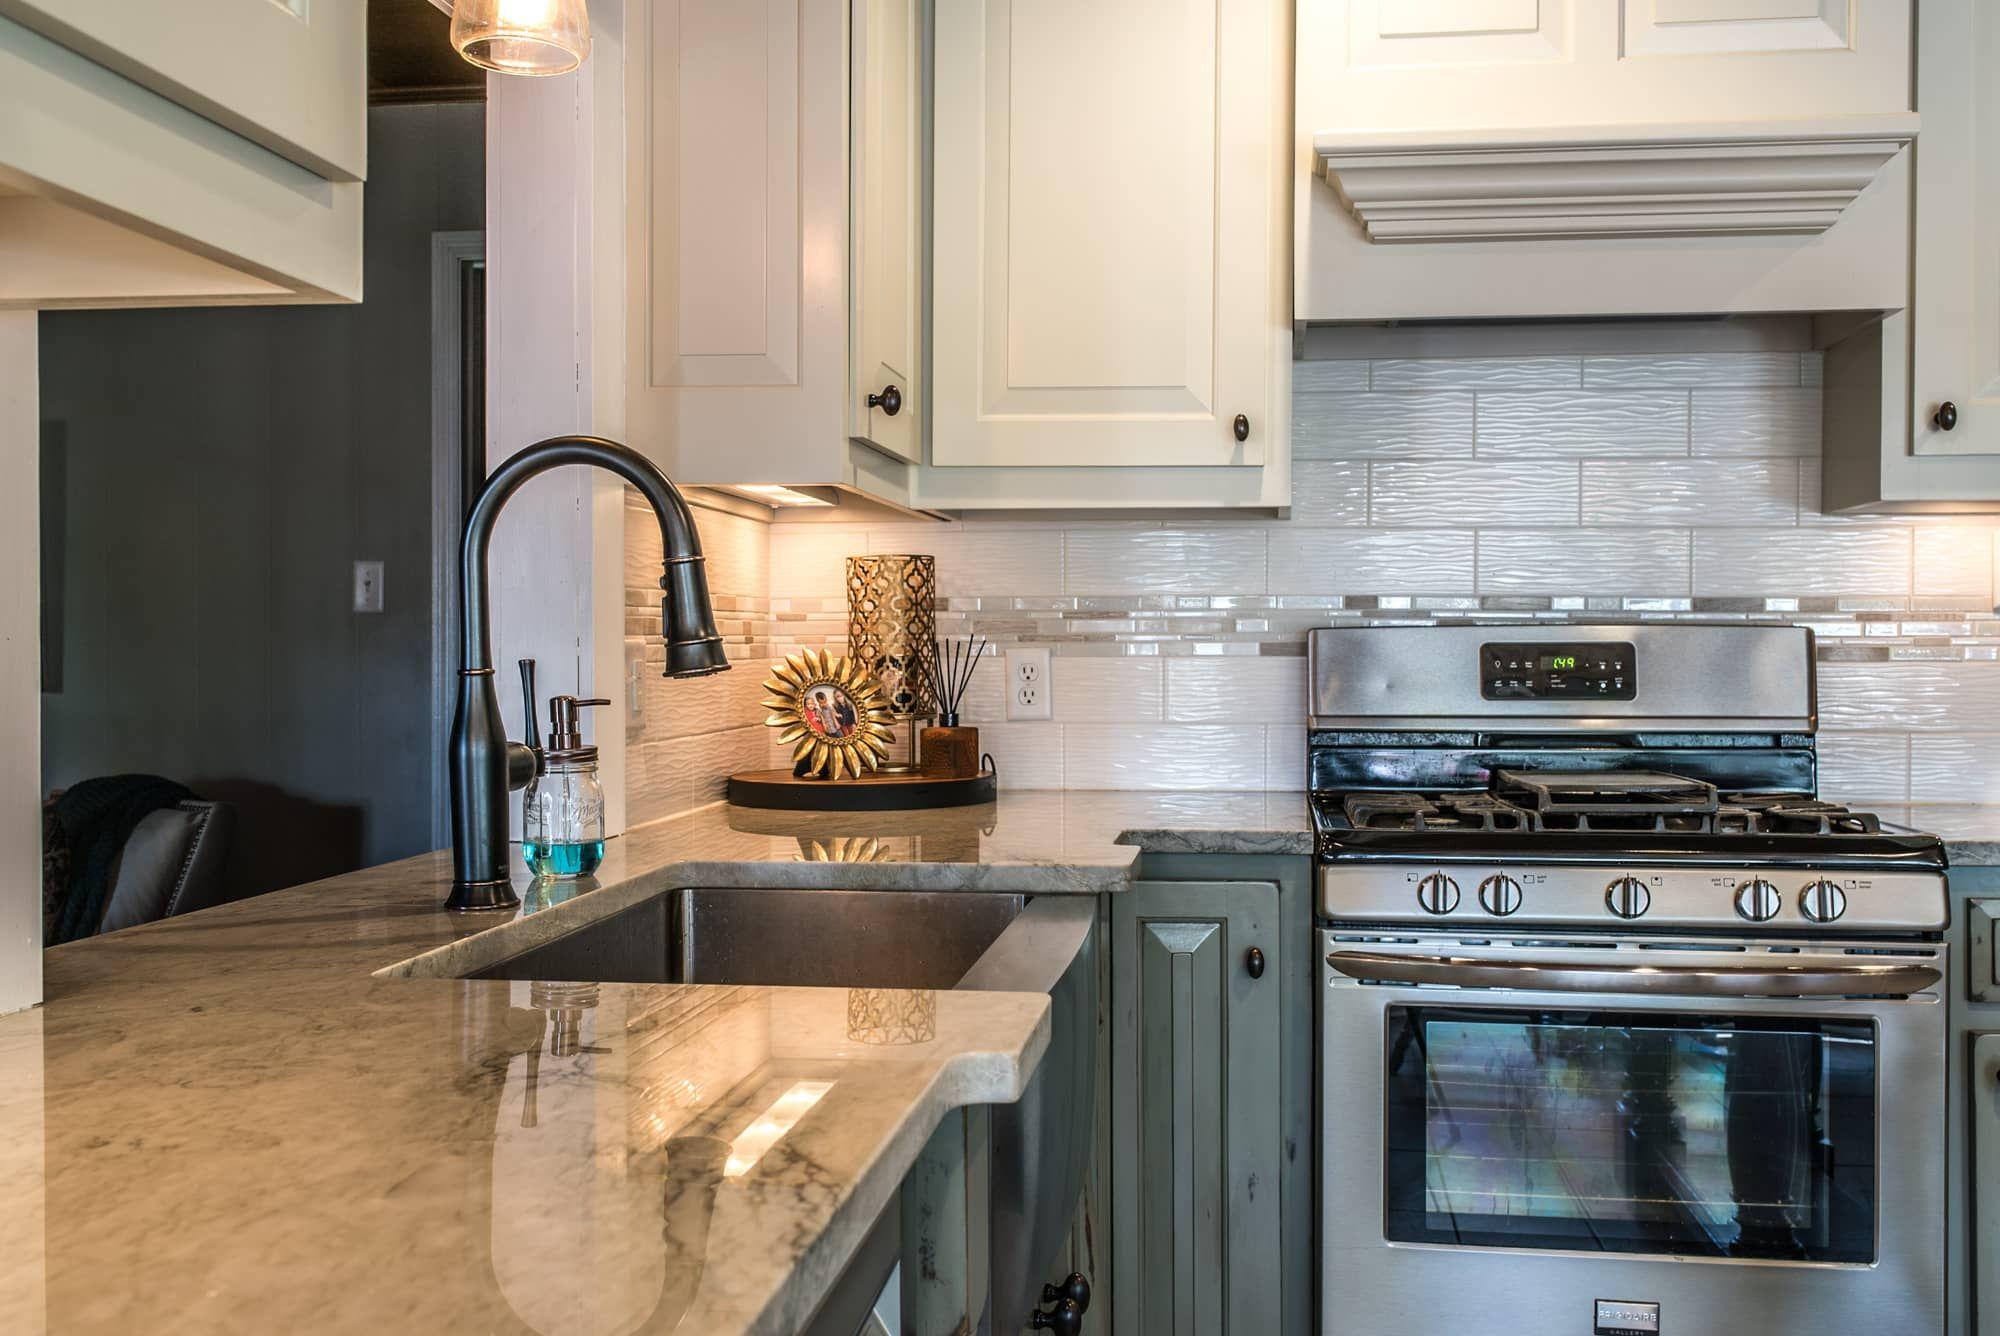 Quartzite Kitchen Countertops Sea Pearl Springfield Mo East Coast Granite Tile 8 In 2020 Best Kitchen Countertops Kitchen Countertops Countertops